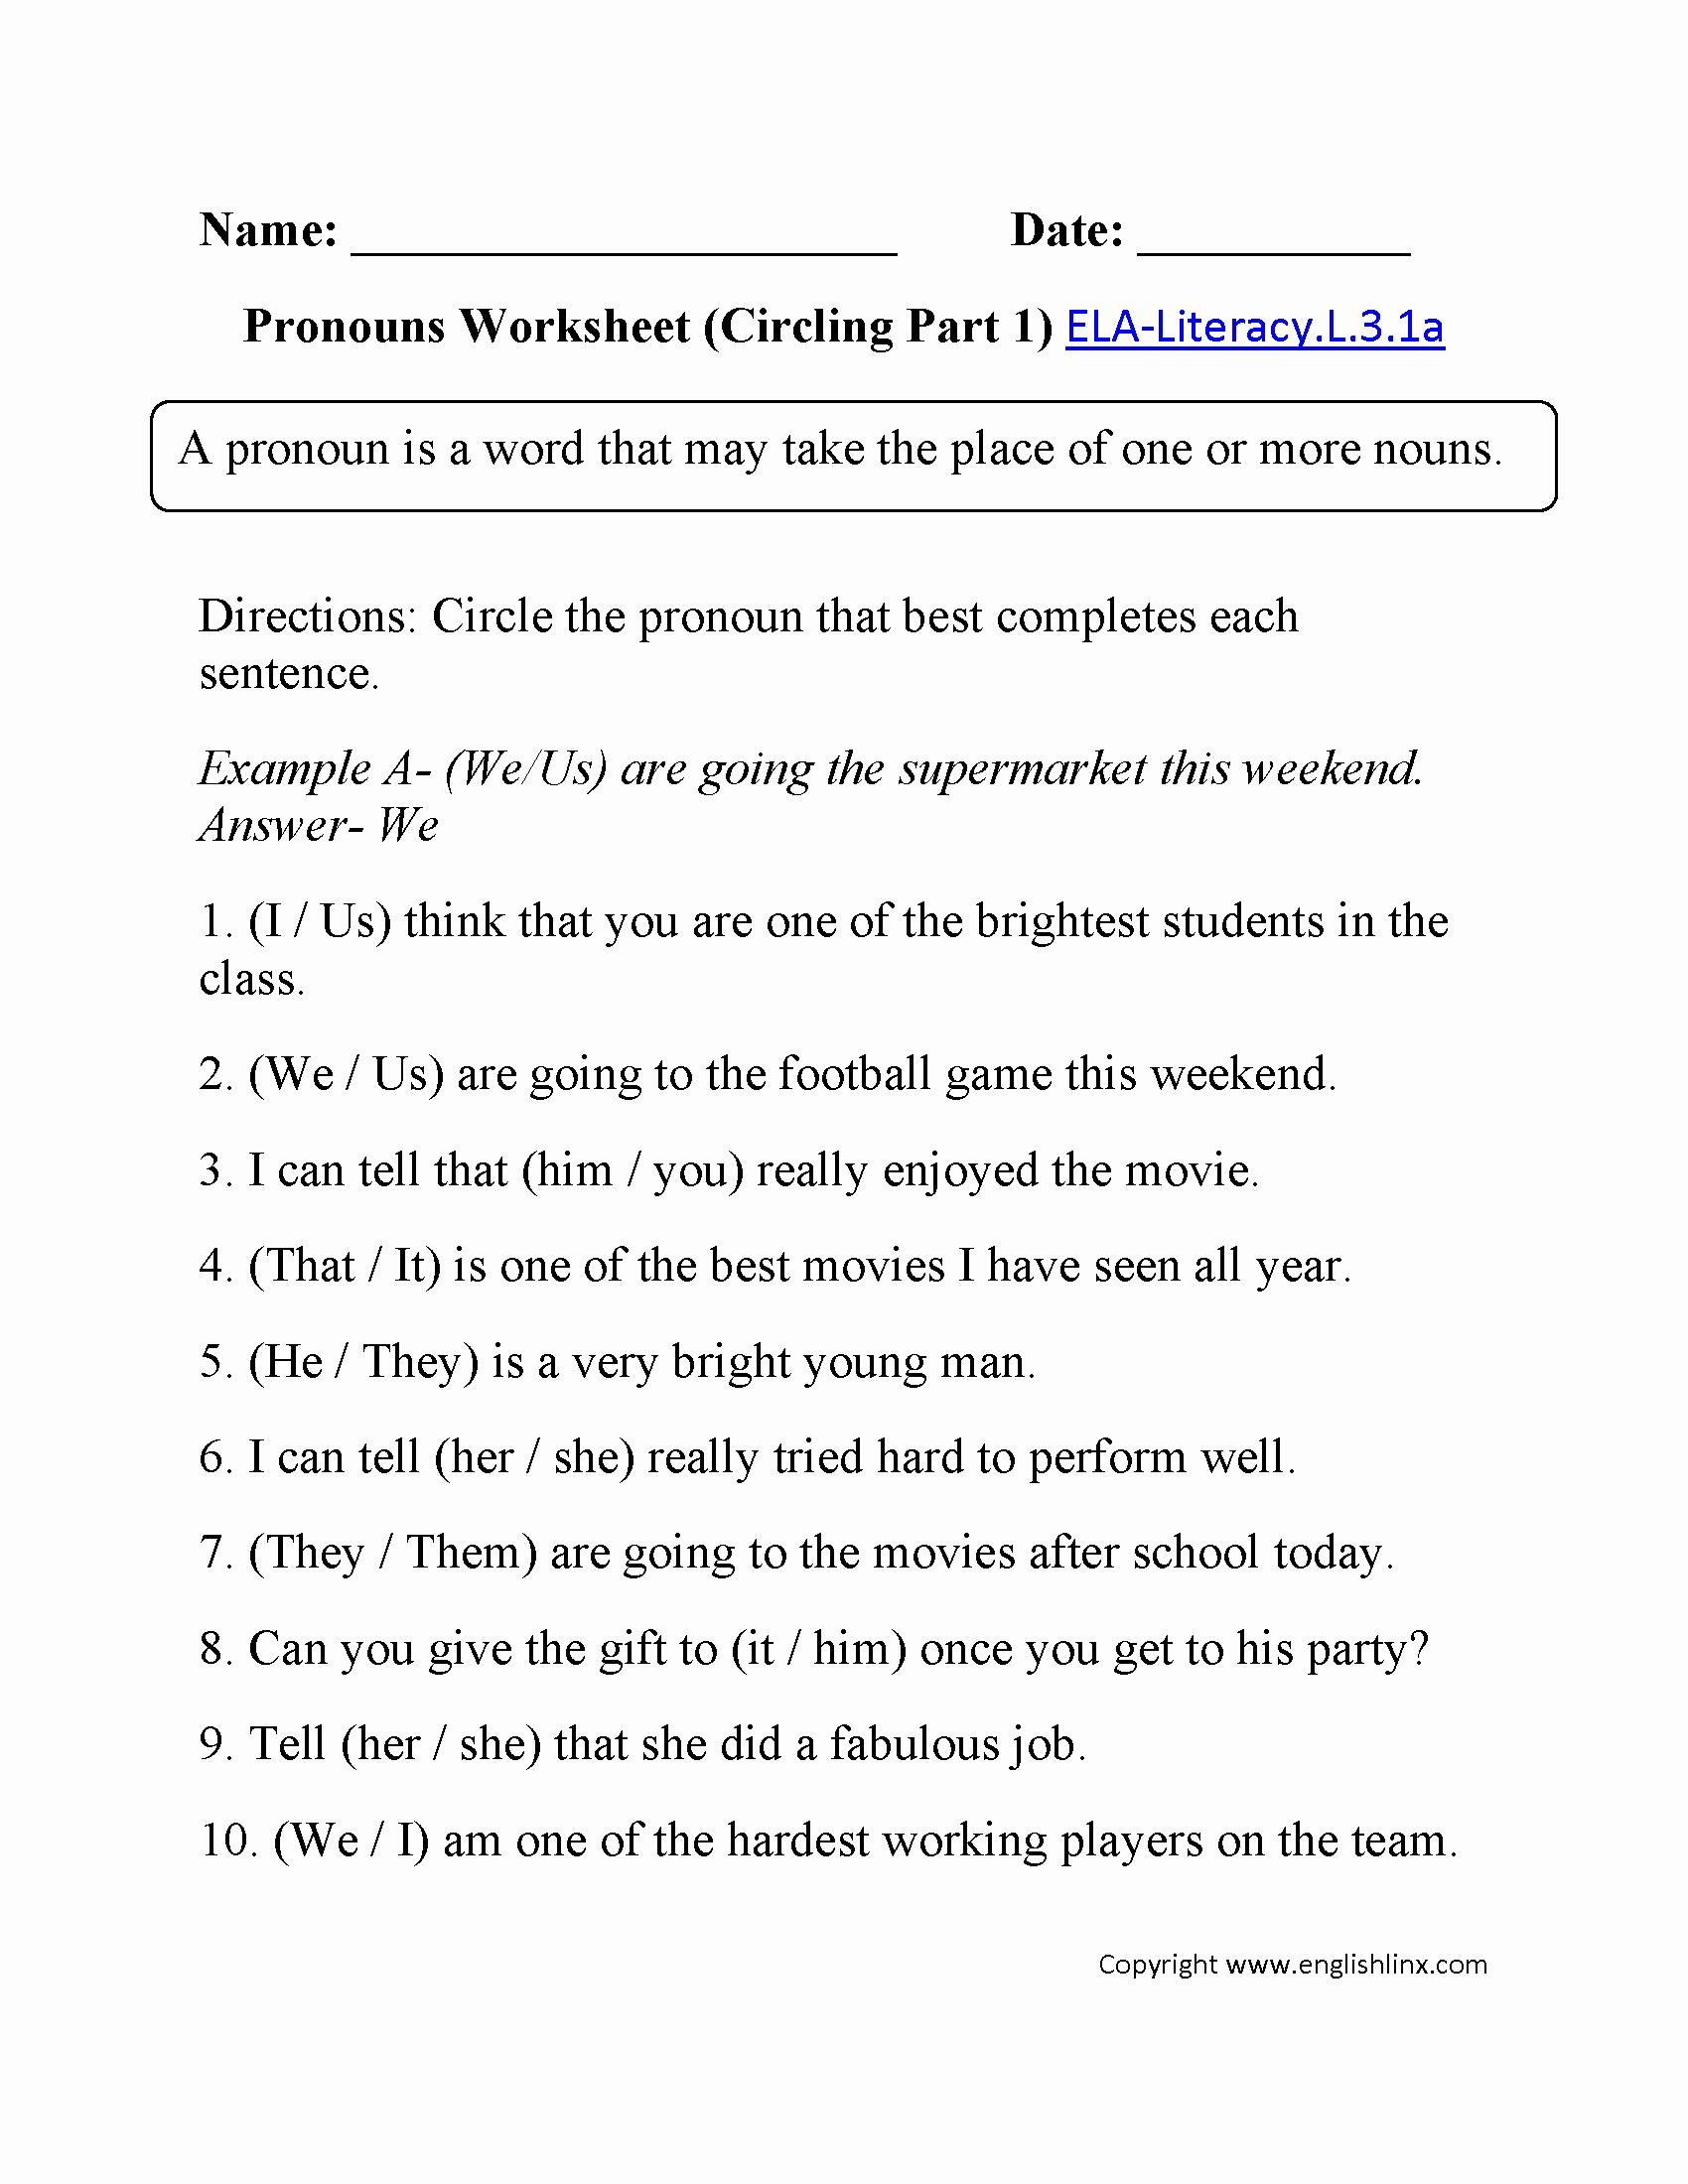 Pronoun Verb Agreement Worksheet Fresh 9 Best Of Pronoun Antecedent Agreement Worksheets